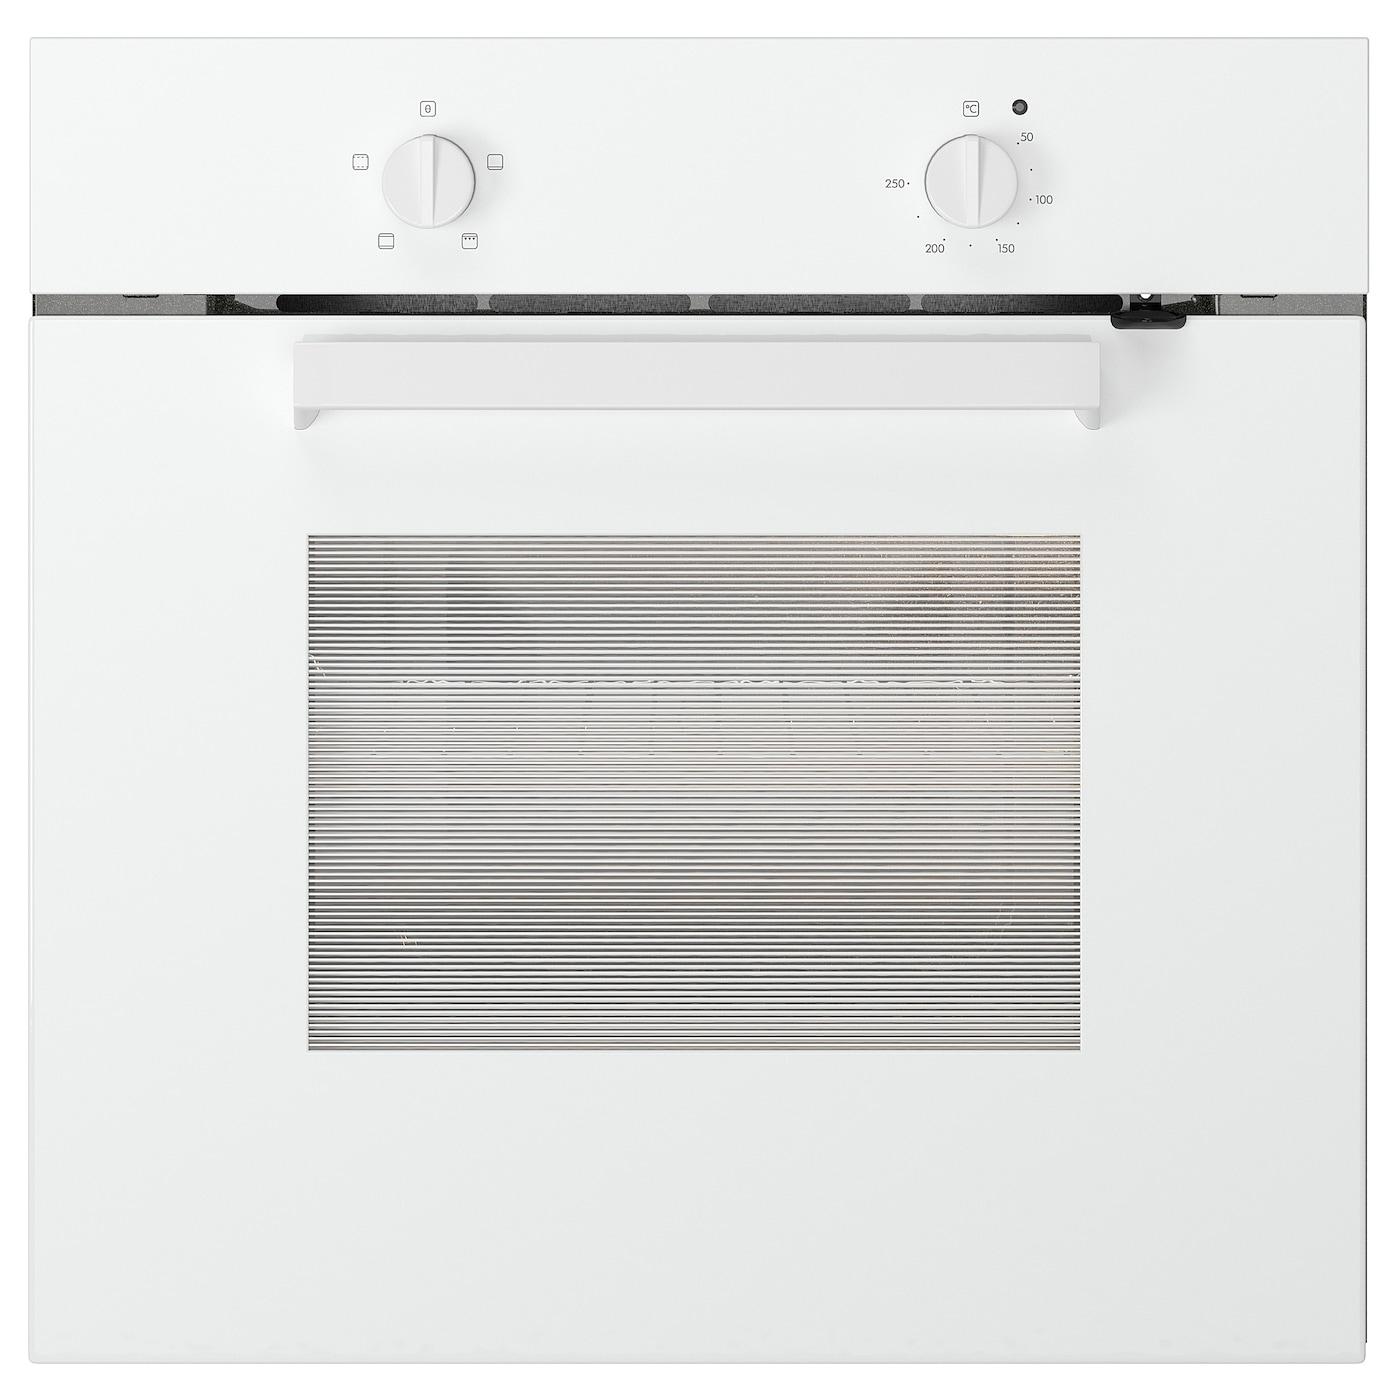 Kitchen Appliances - White Goods - Domestic Appliances - IKEA